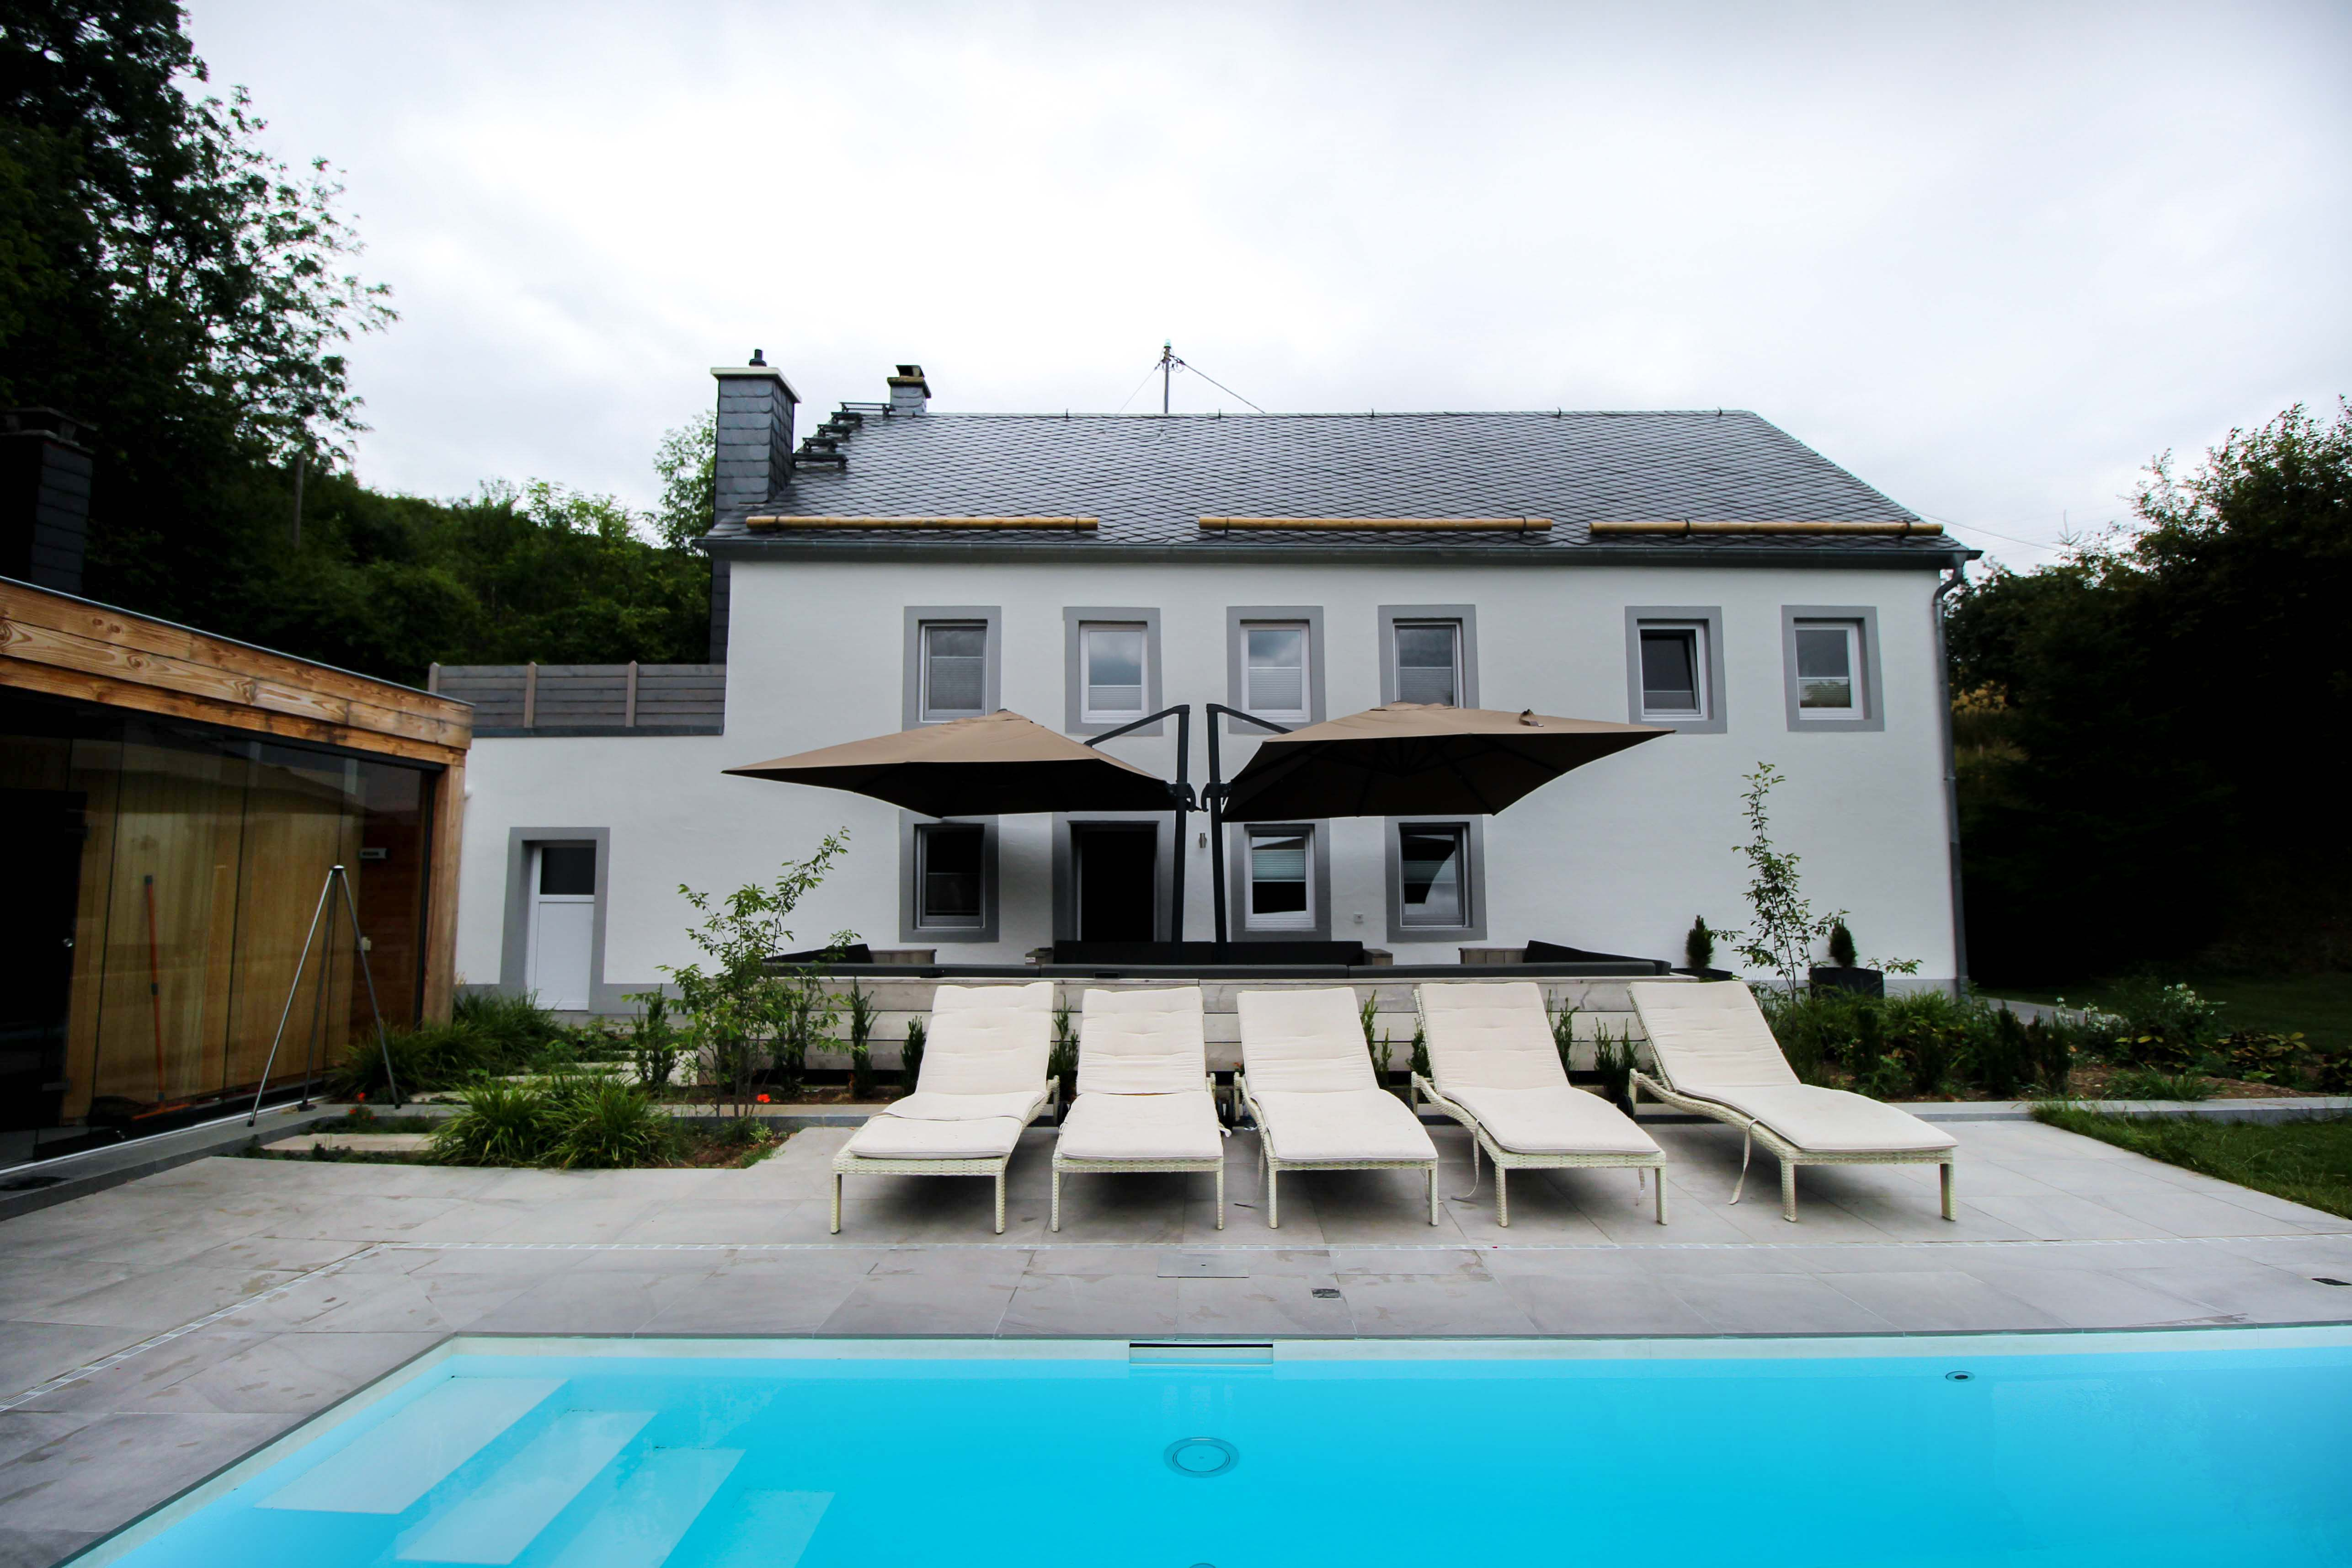 Geburtstagsfeier Location Villa Eifel Deutschland besondere Location JGA Villa mieten Muxerath Villa Steinshof Hasenhof Pool 4